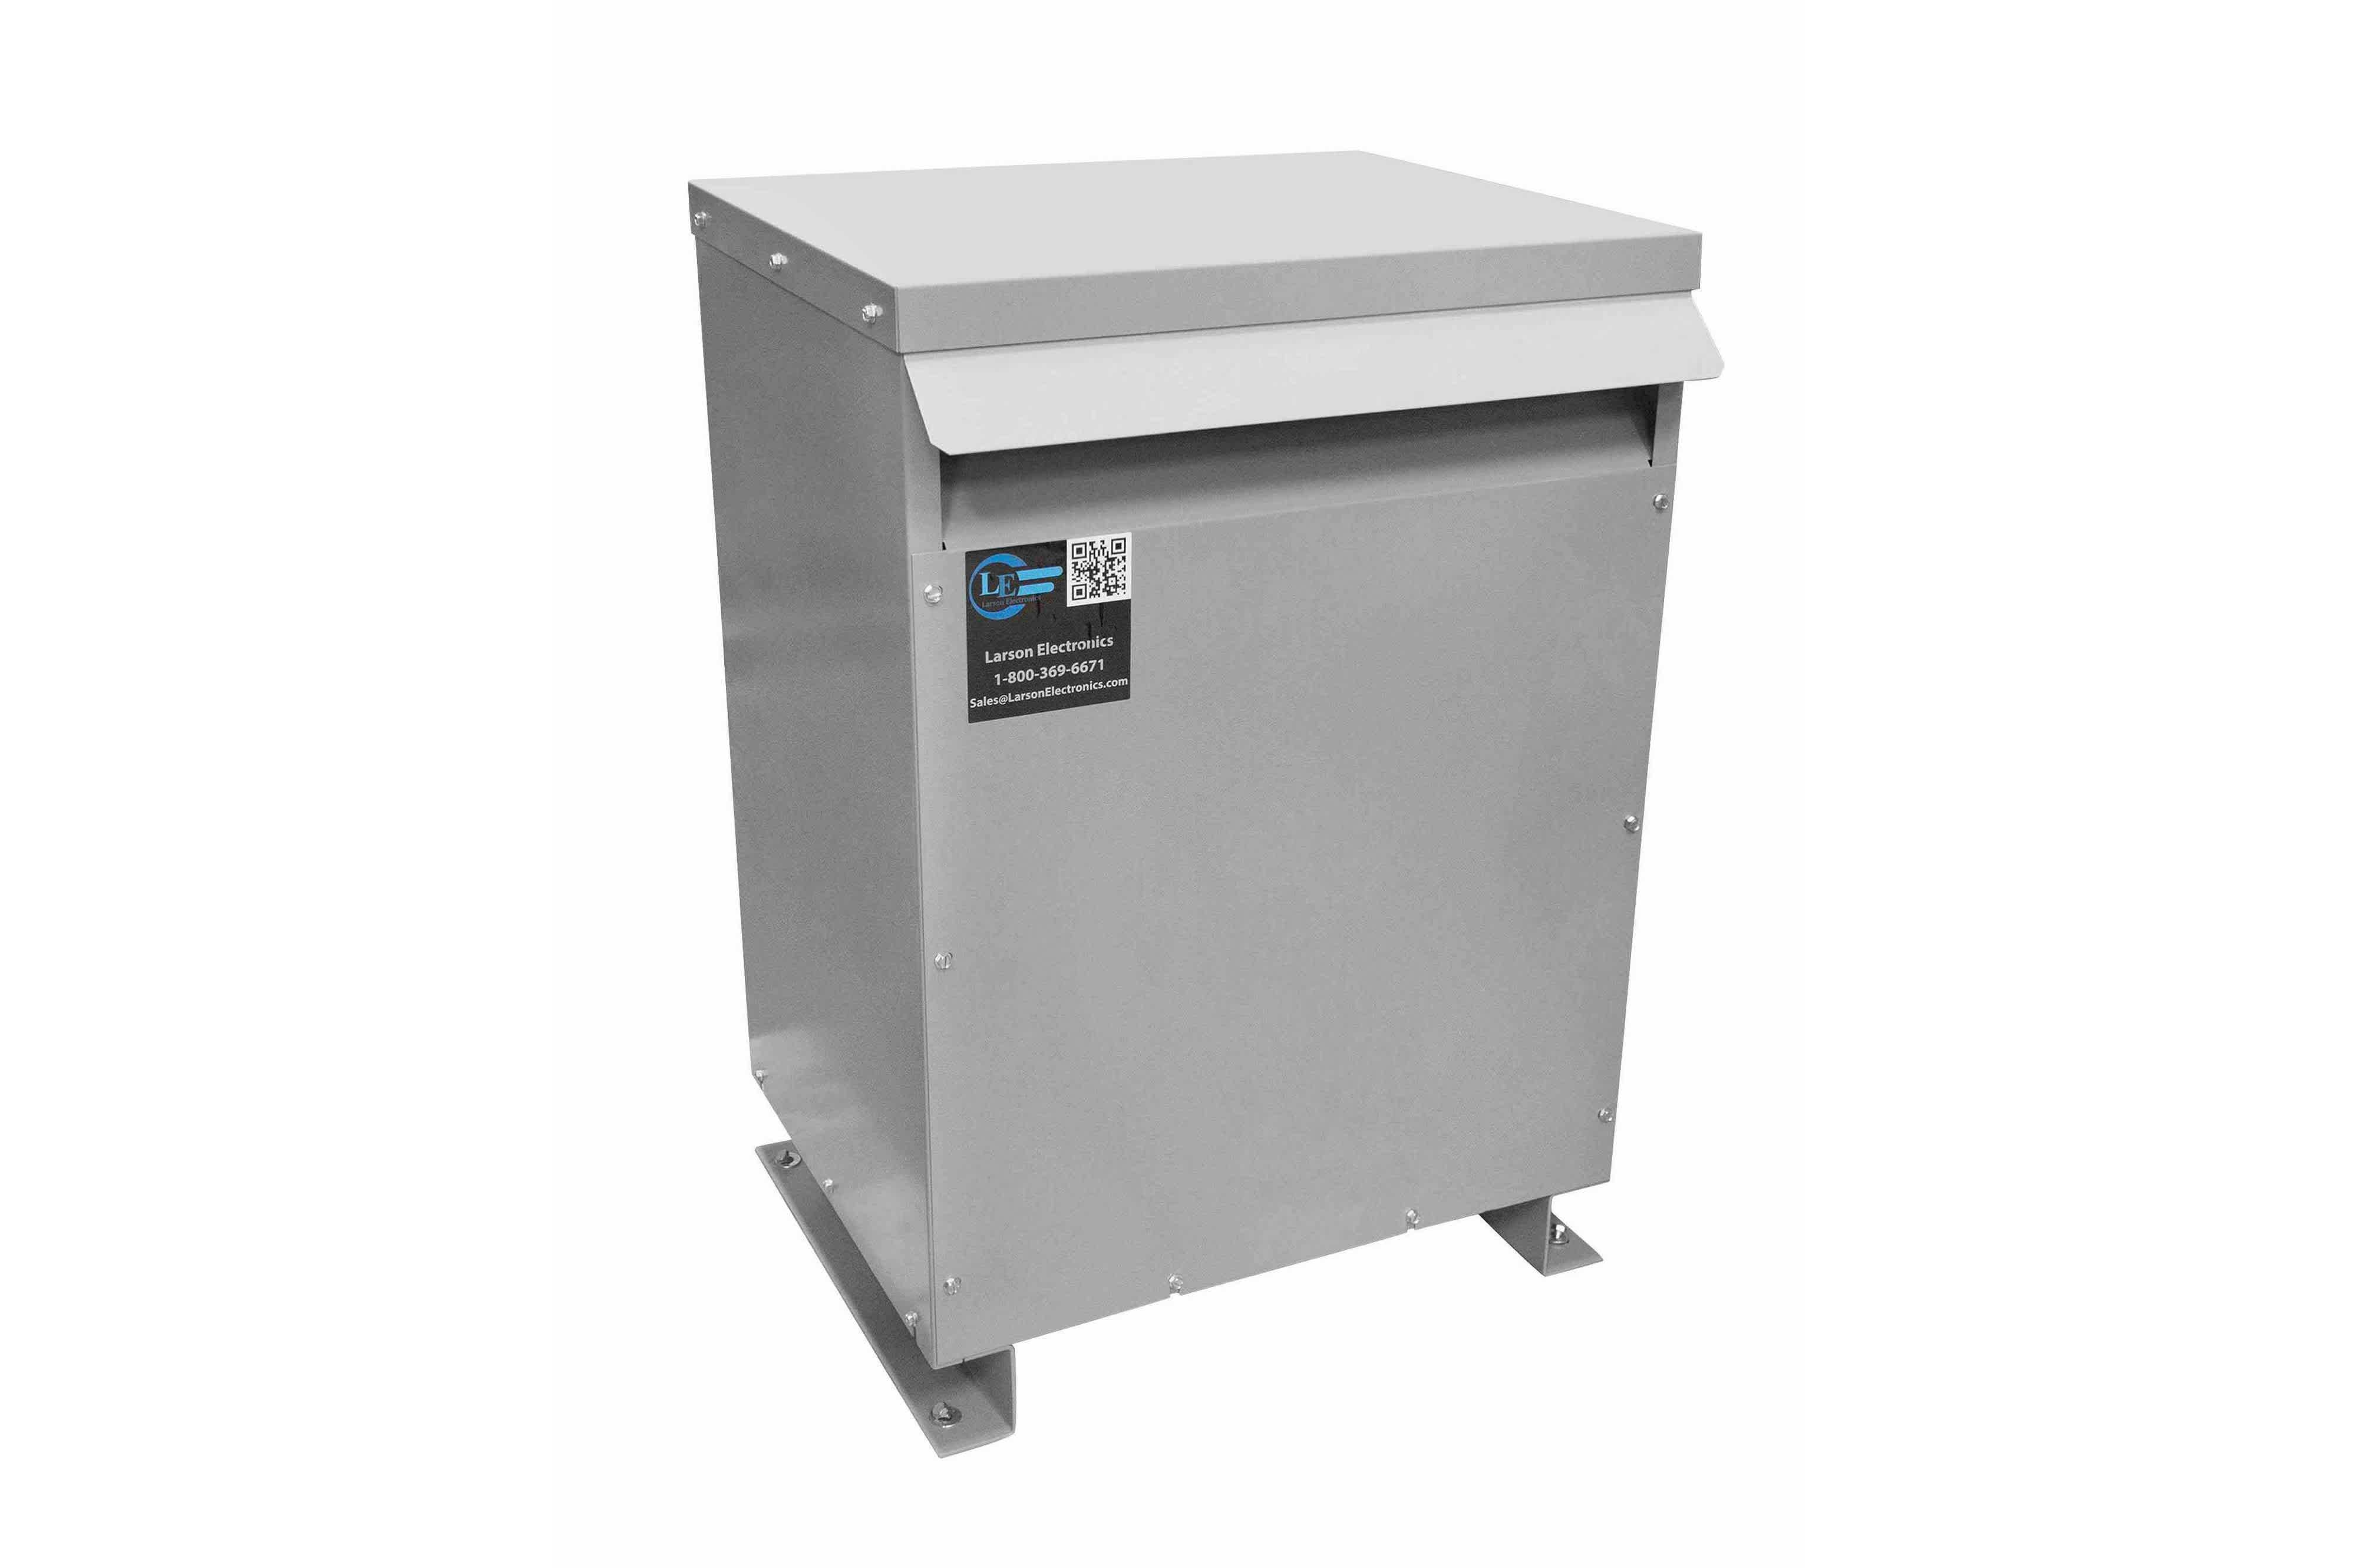 38 kVA 3PH Isolation Transformer, 600V Wye Primary, 380Y/220 Wye-N Secondary, N3R, Ventilated, 60 Hz